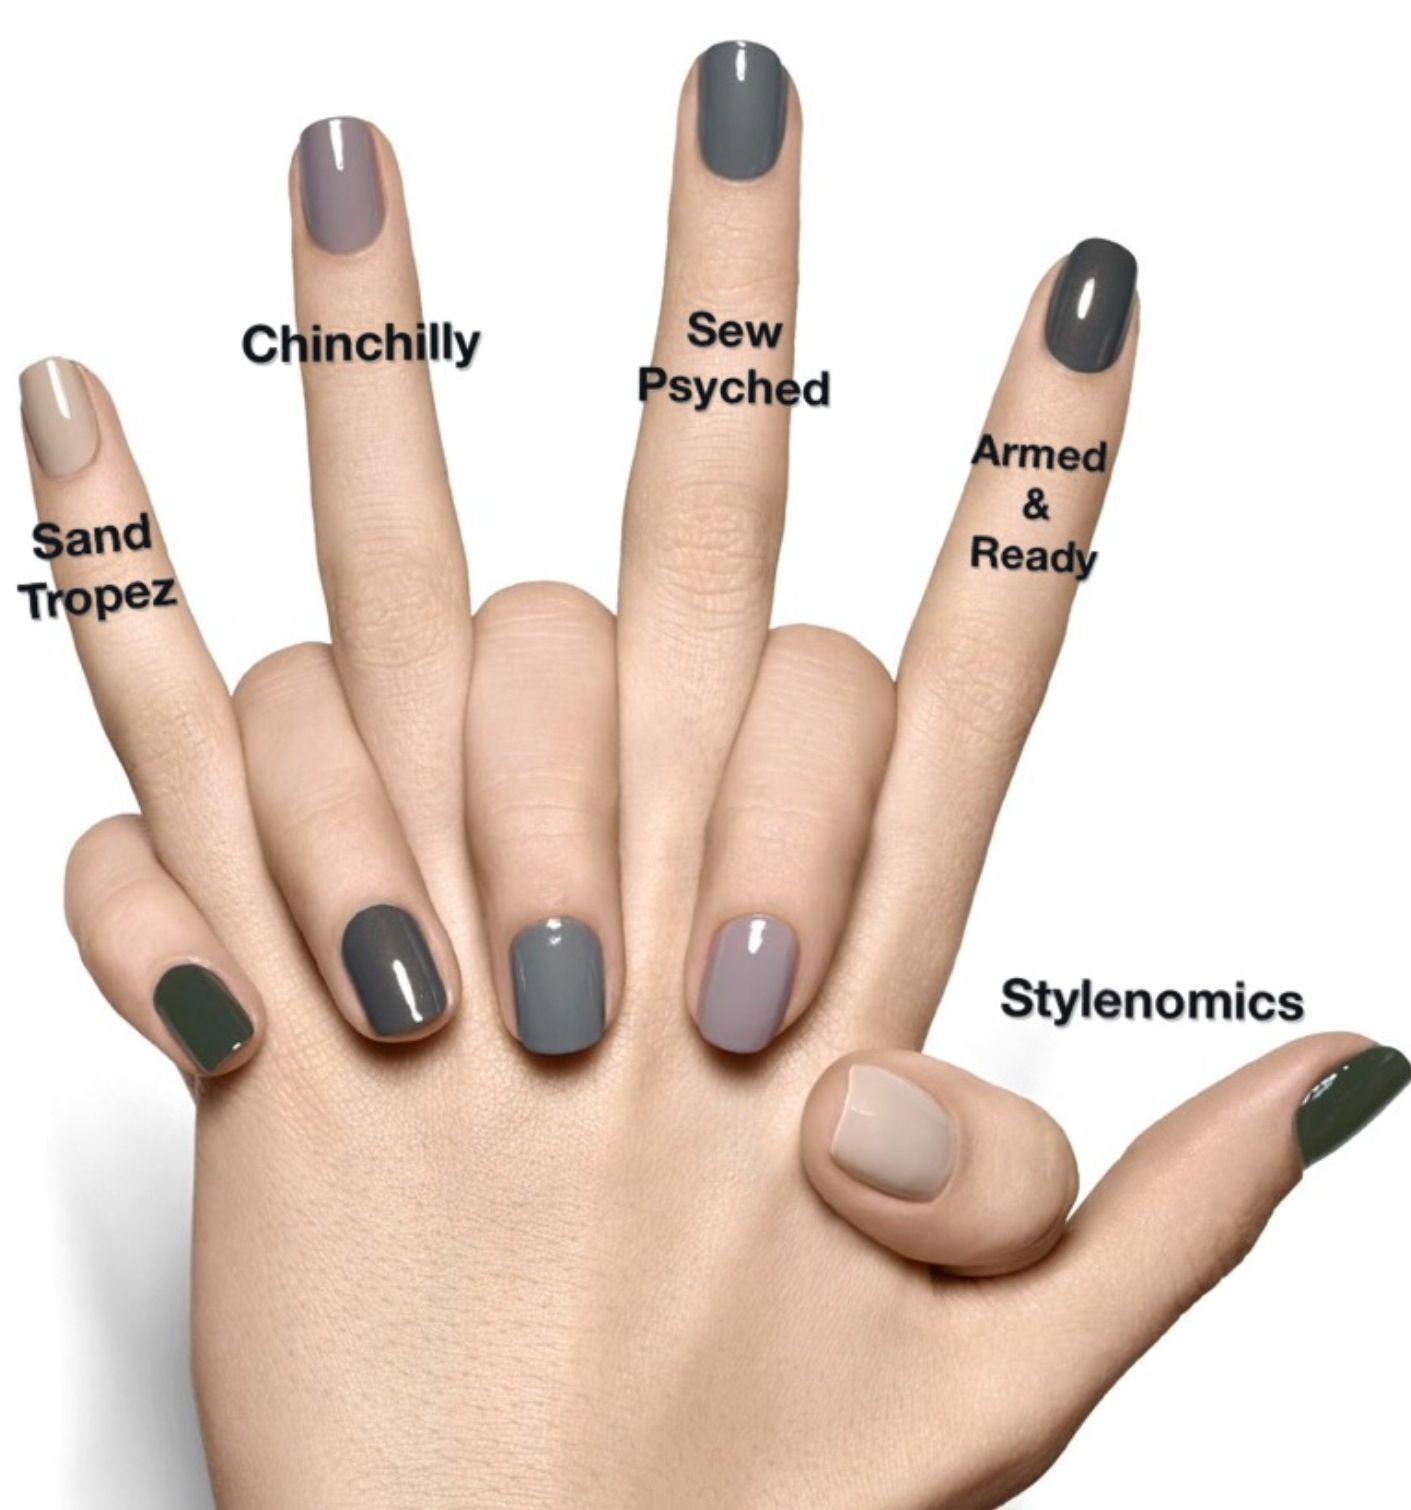 Pin de Marta Faz en nails *_* | Pinterest | Diseños de uñas ...